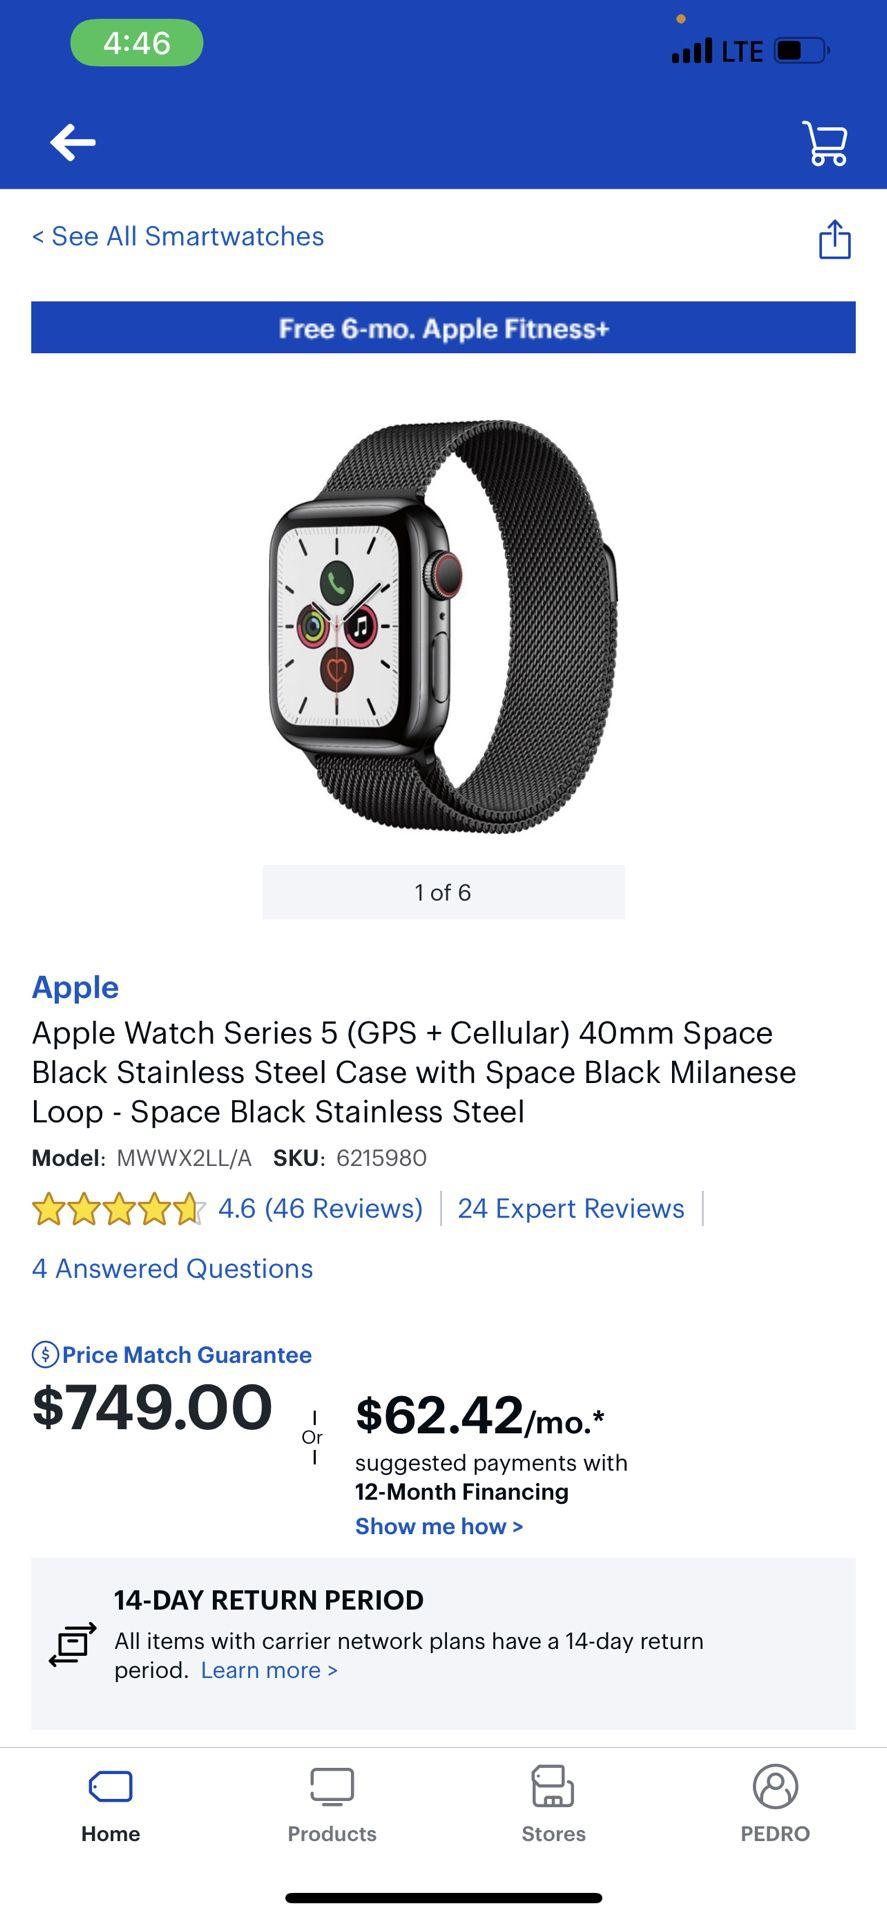 Apple Watch Series 5 (GPS+ Cellular)